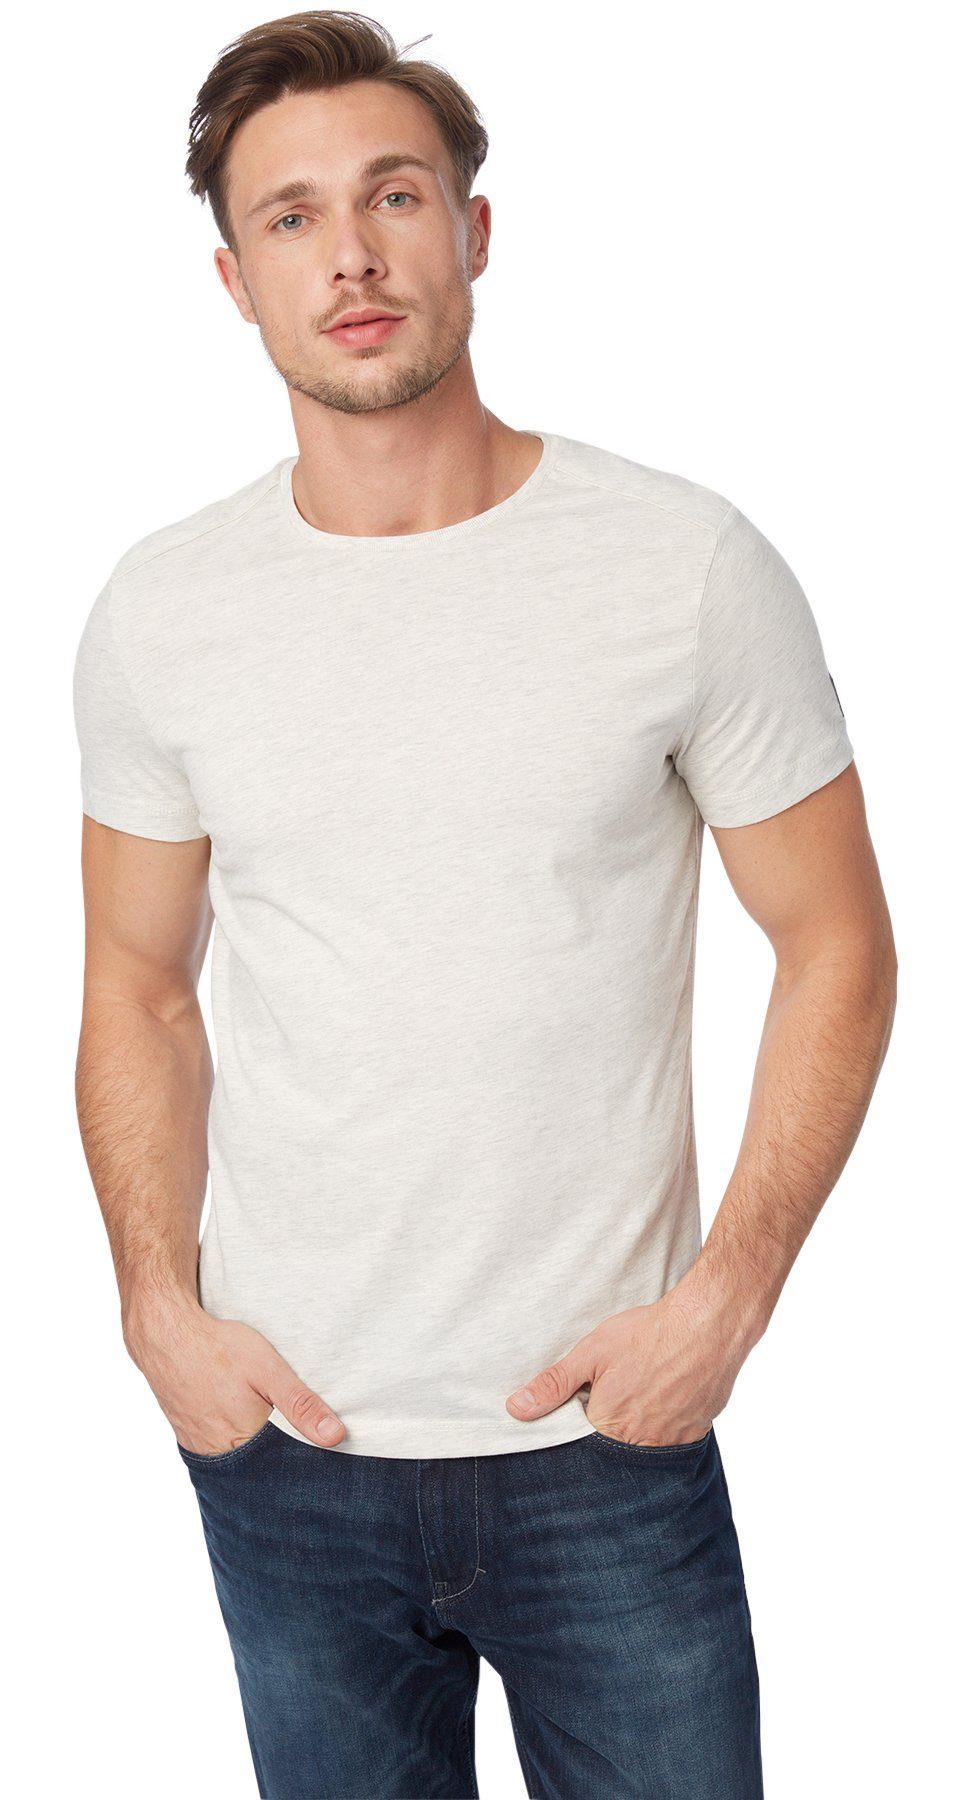 TOM TAILOR T-Shirt »Melange-Shirt mit Steppung«